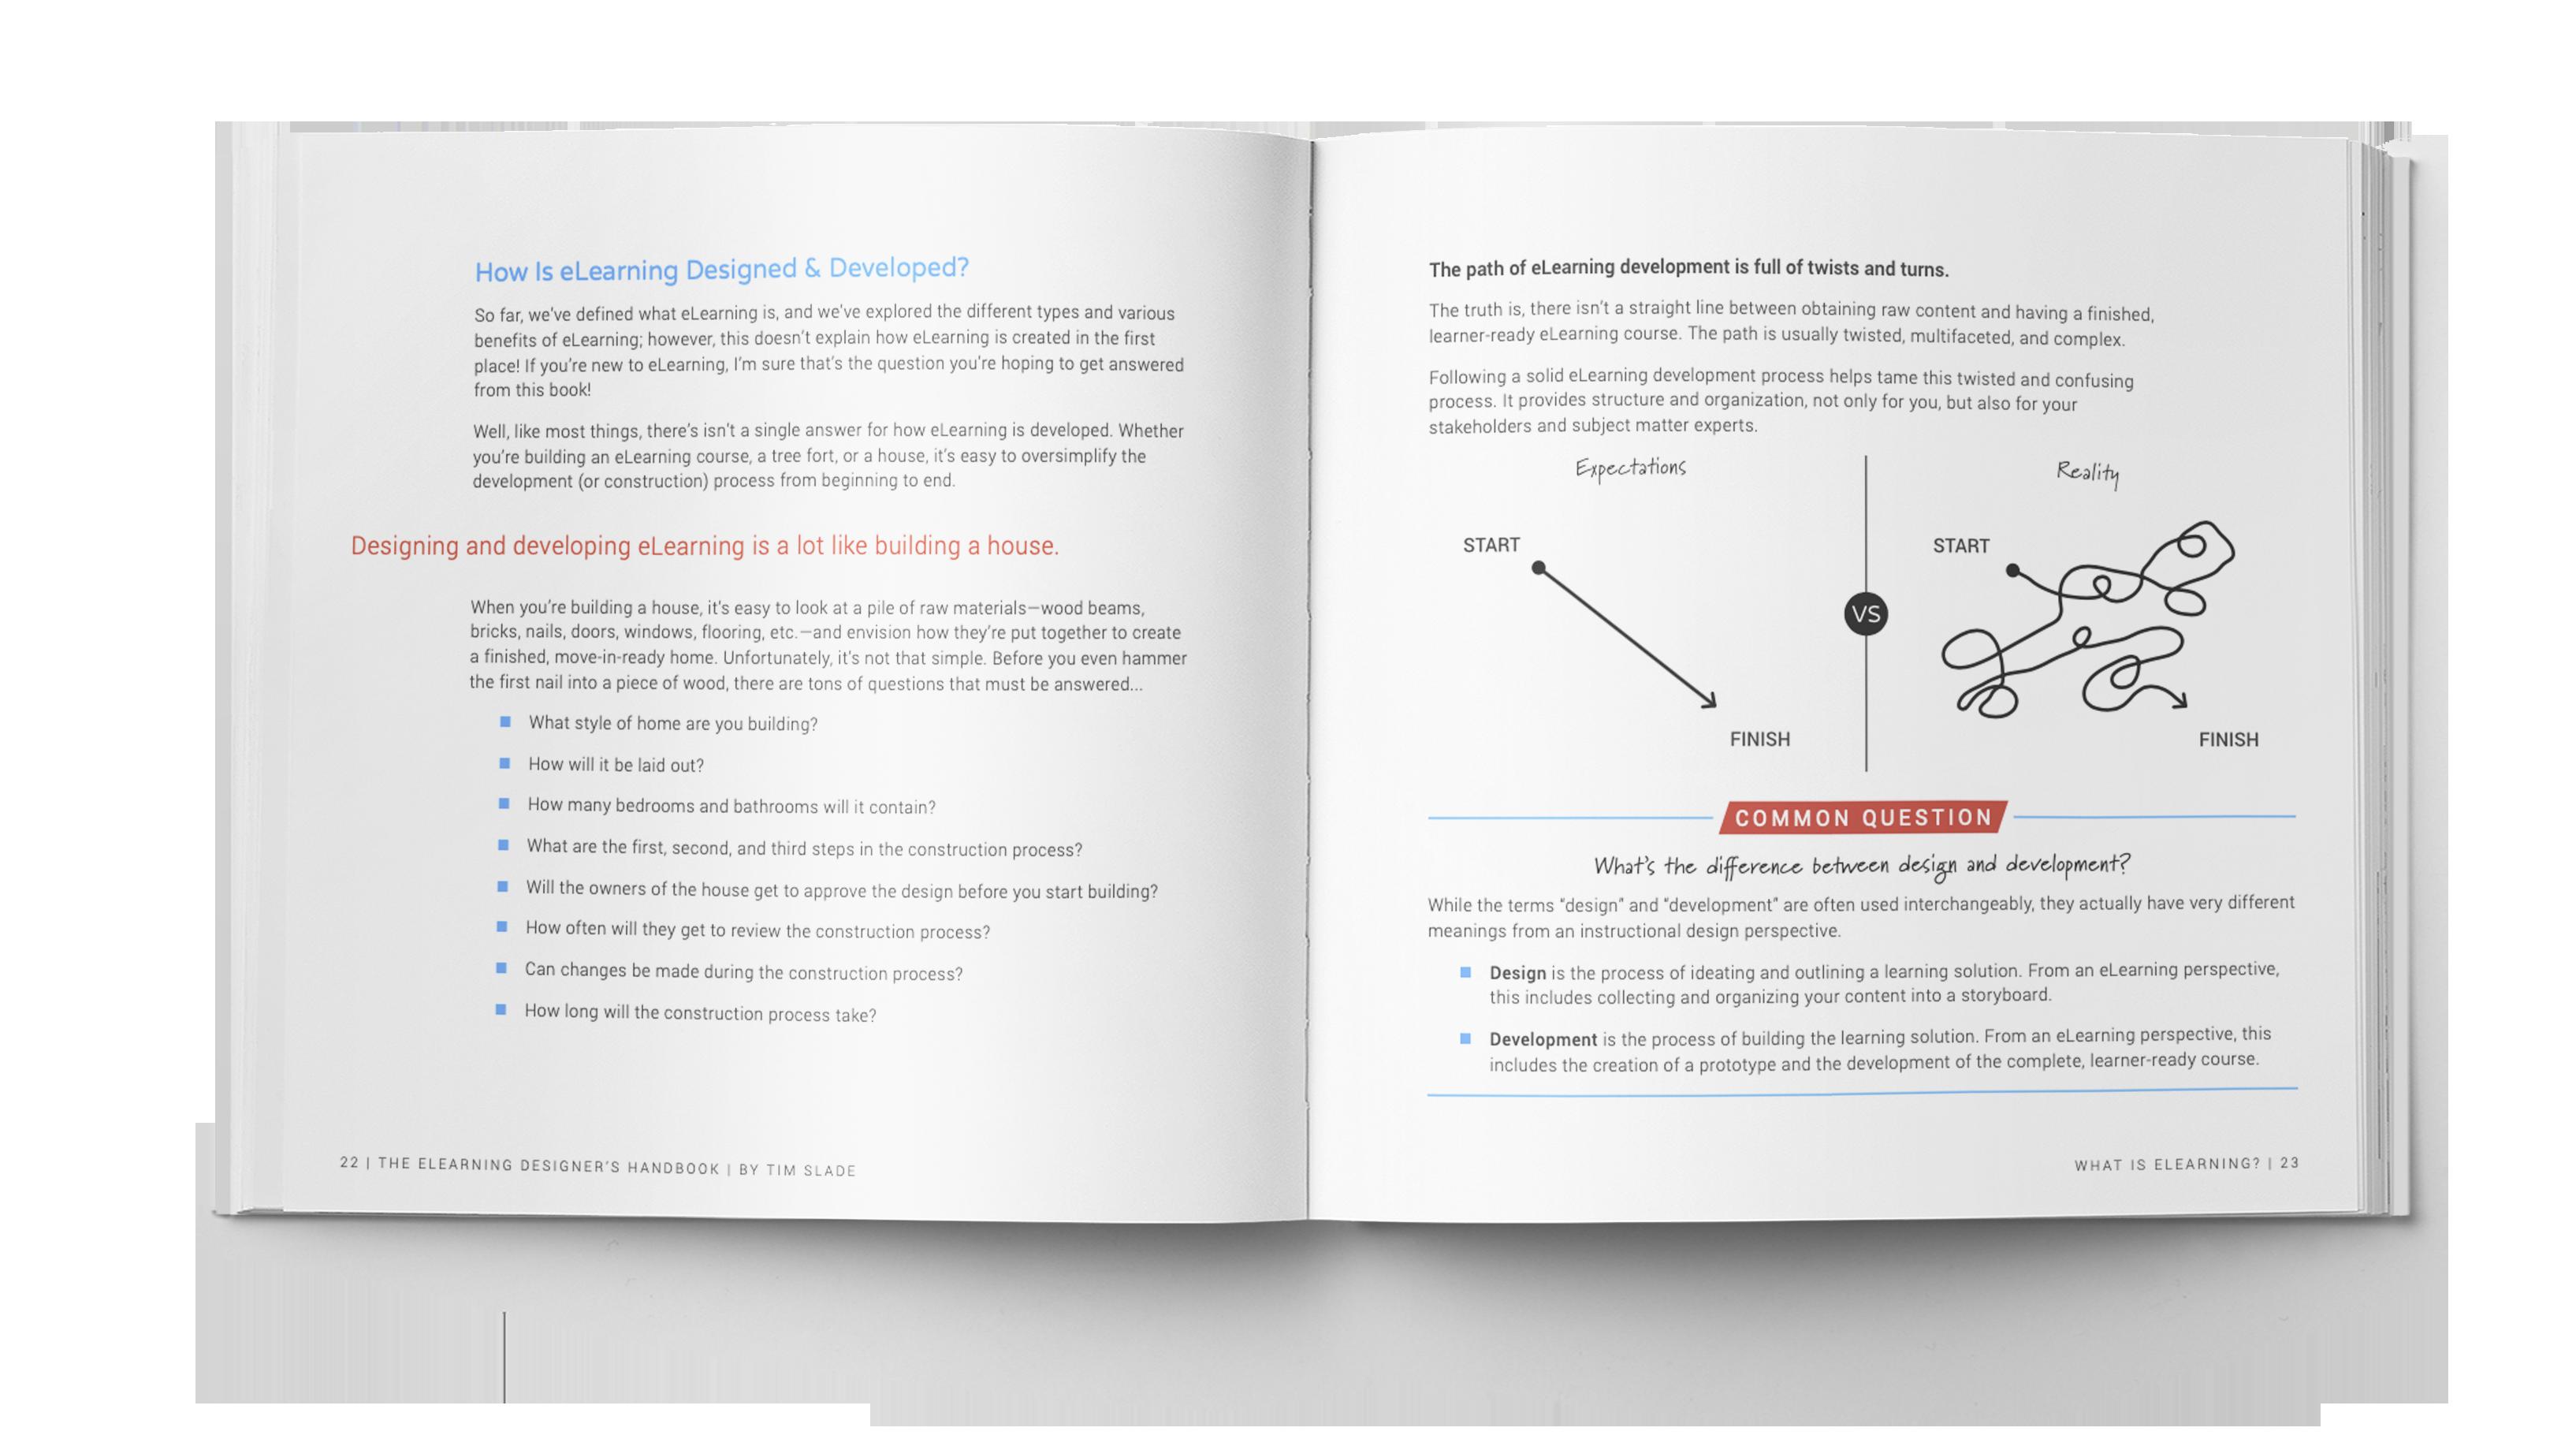 The eLearning Designer's Handbook by Tim Slade   What is eLearning?   Freelance eLearning Designer   The eLearning Designer's Academy